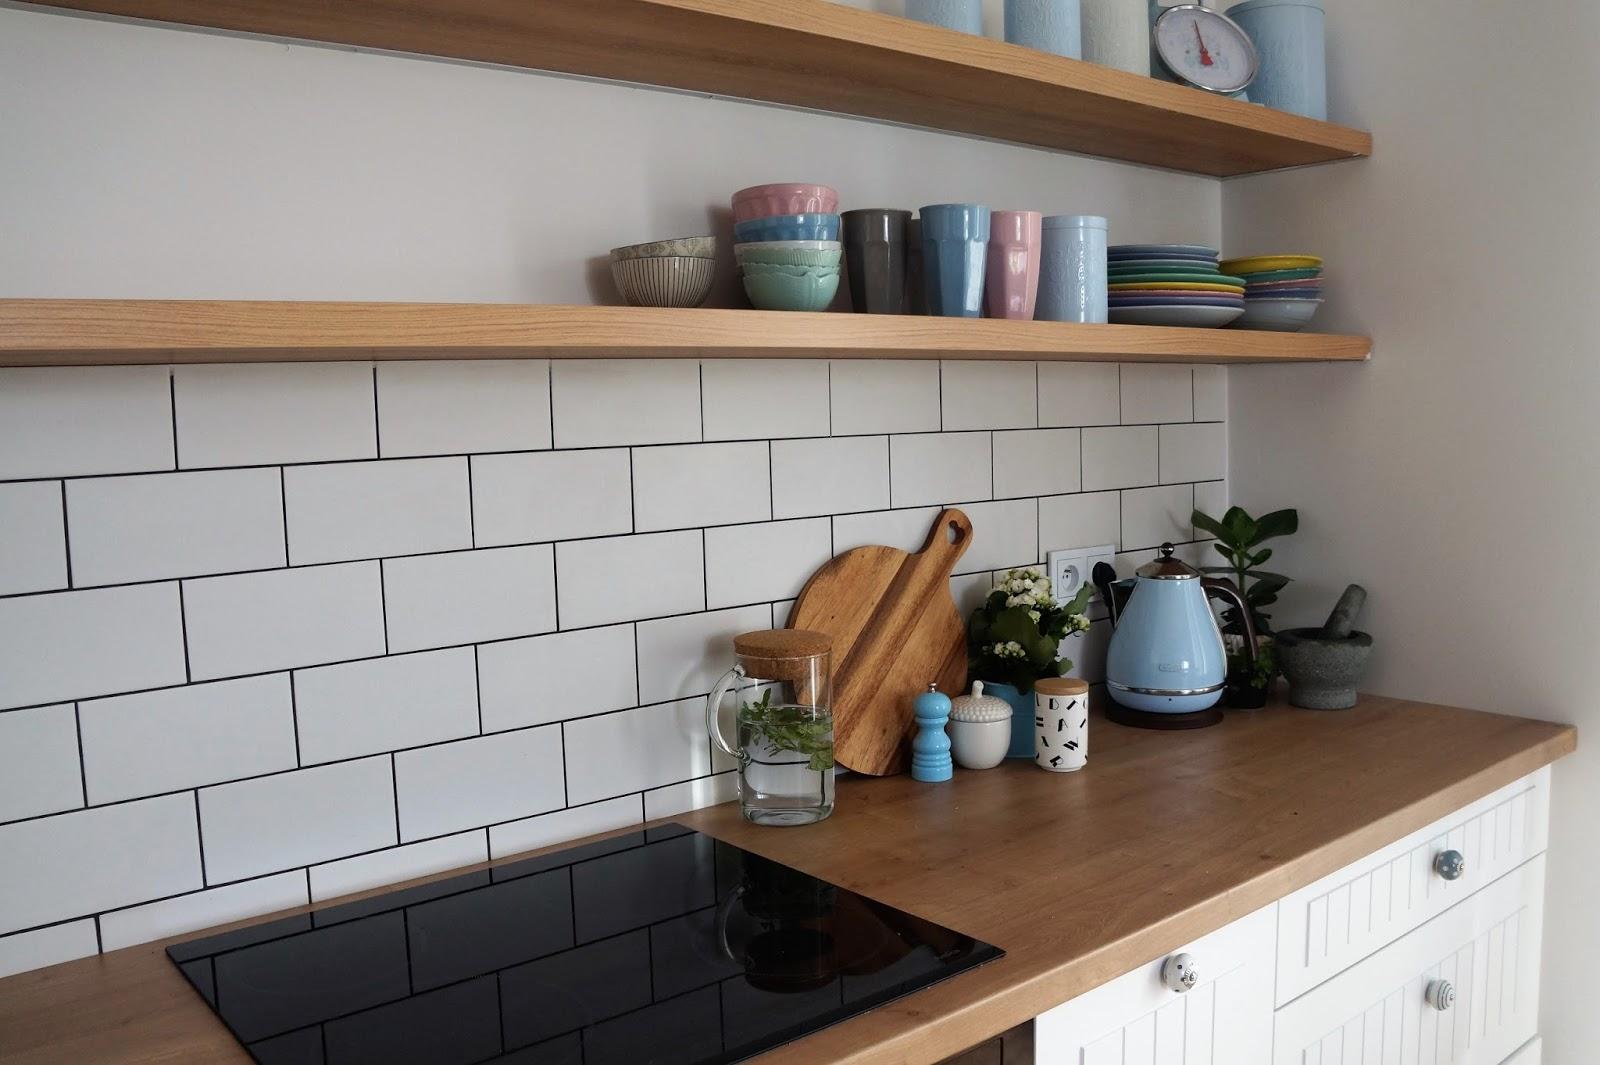 delonghi vintage icona, czajnik błękitny, kuchnia retro, pastelowa kuchnia